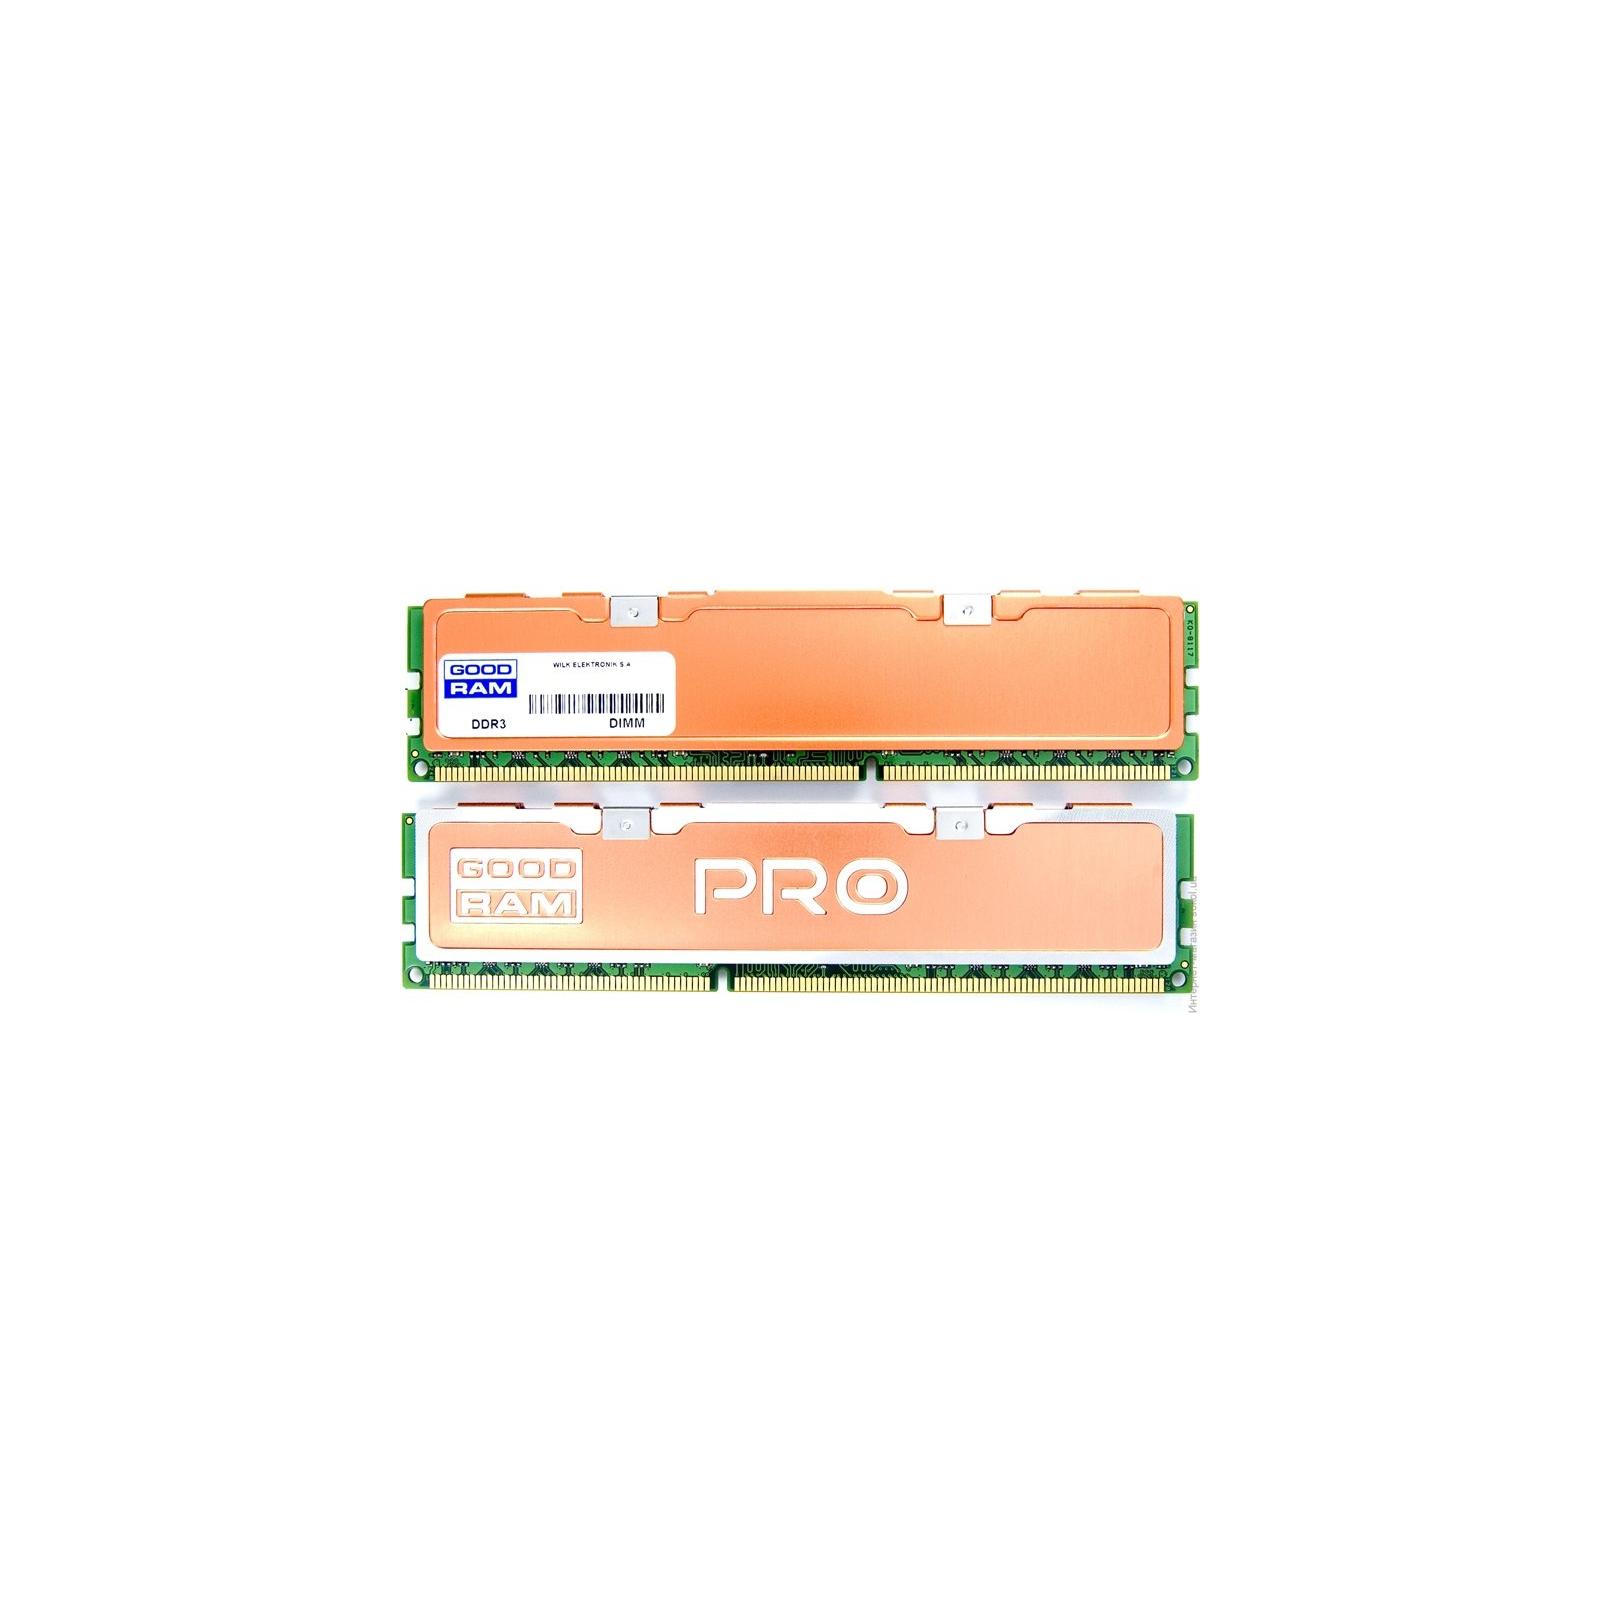 Модуль памяти для компьютера DDR3 8Gb (2x4GB) 2133 MHz PRO GOODRAM (GP2133D364L10AS/8GDC)